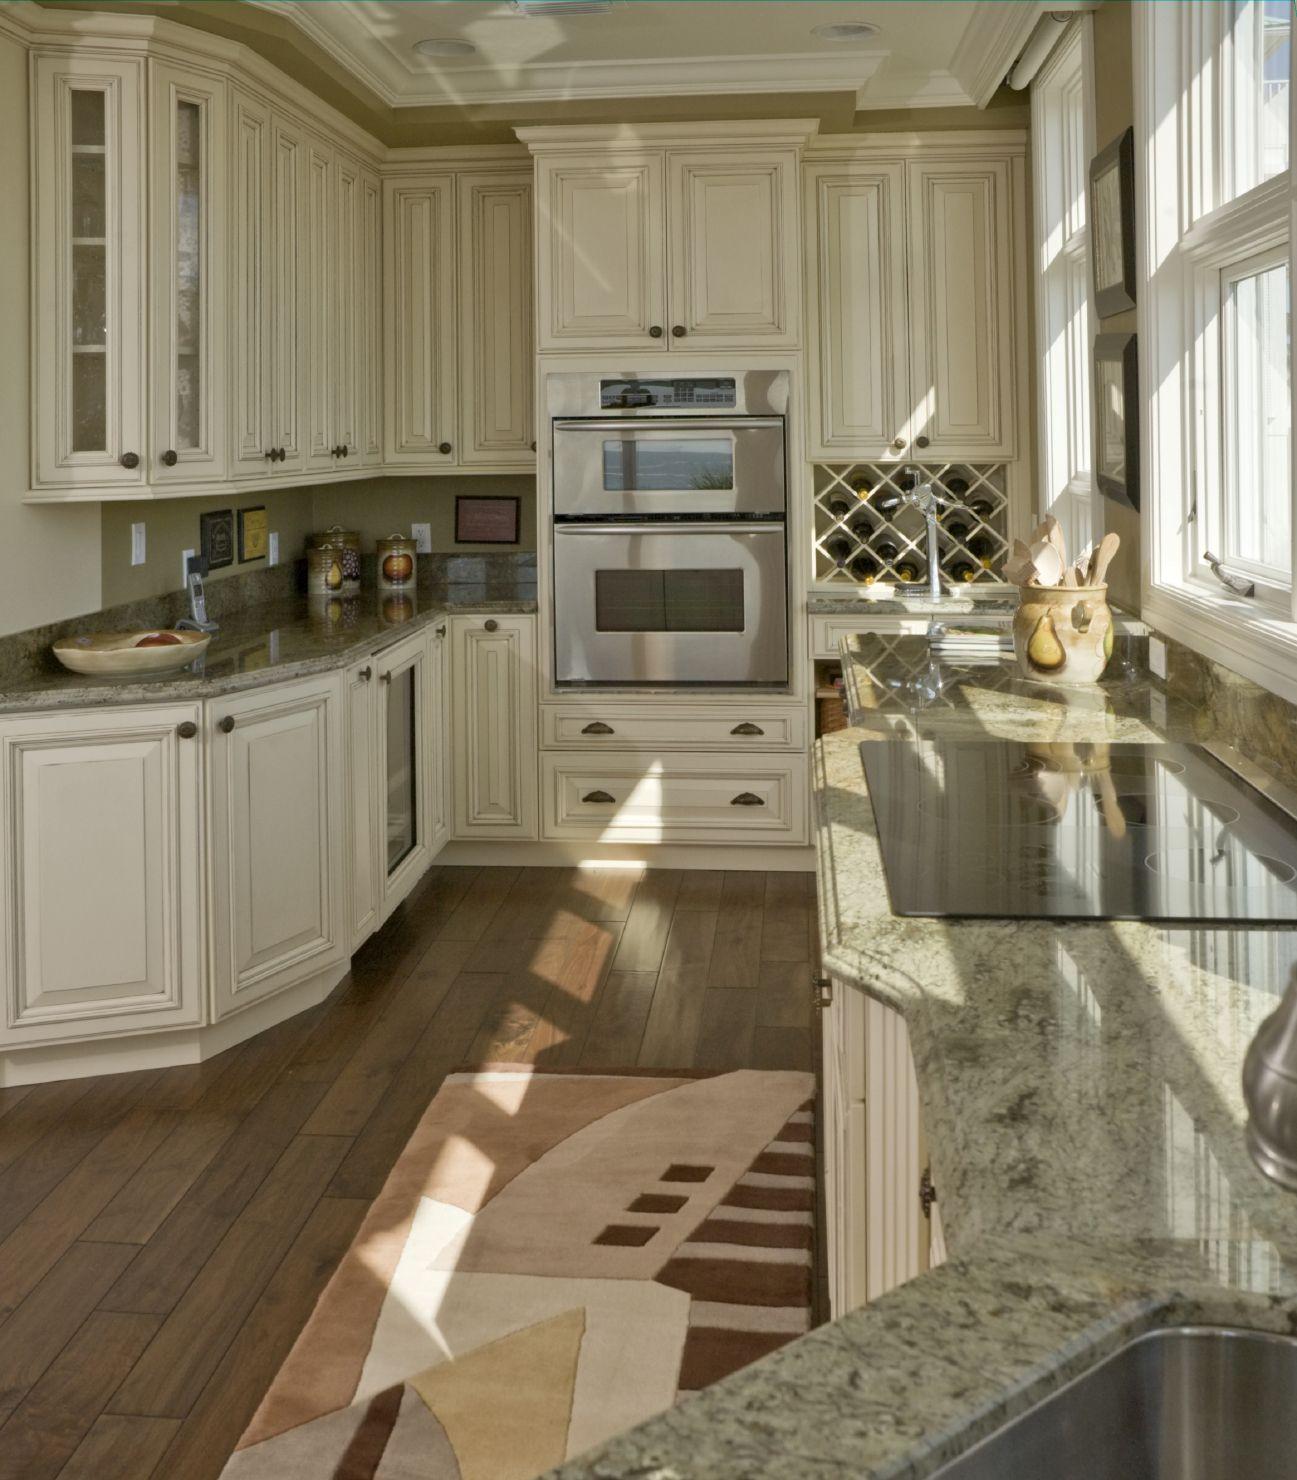 41 white kitchen interior design & decor ideas (pictures